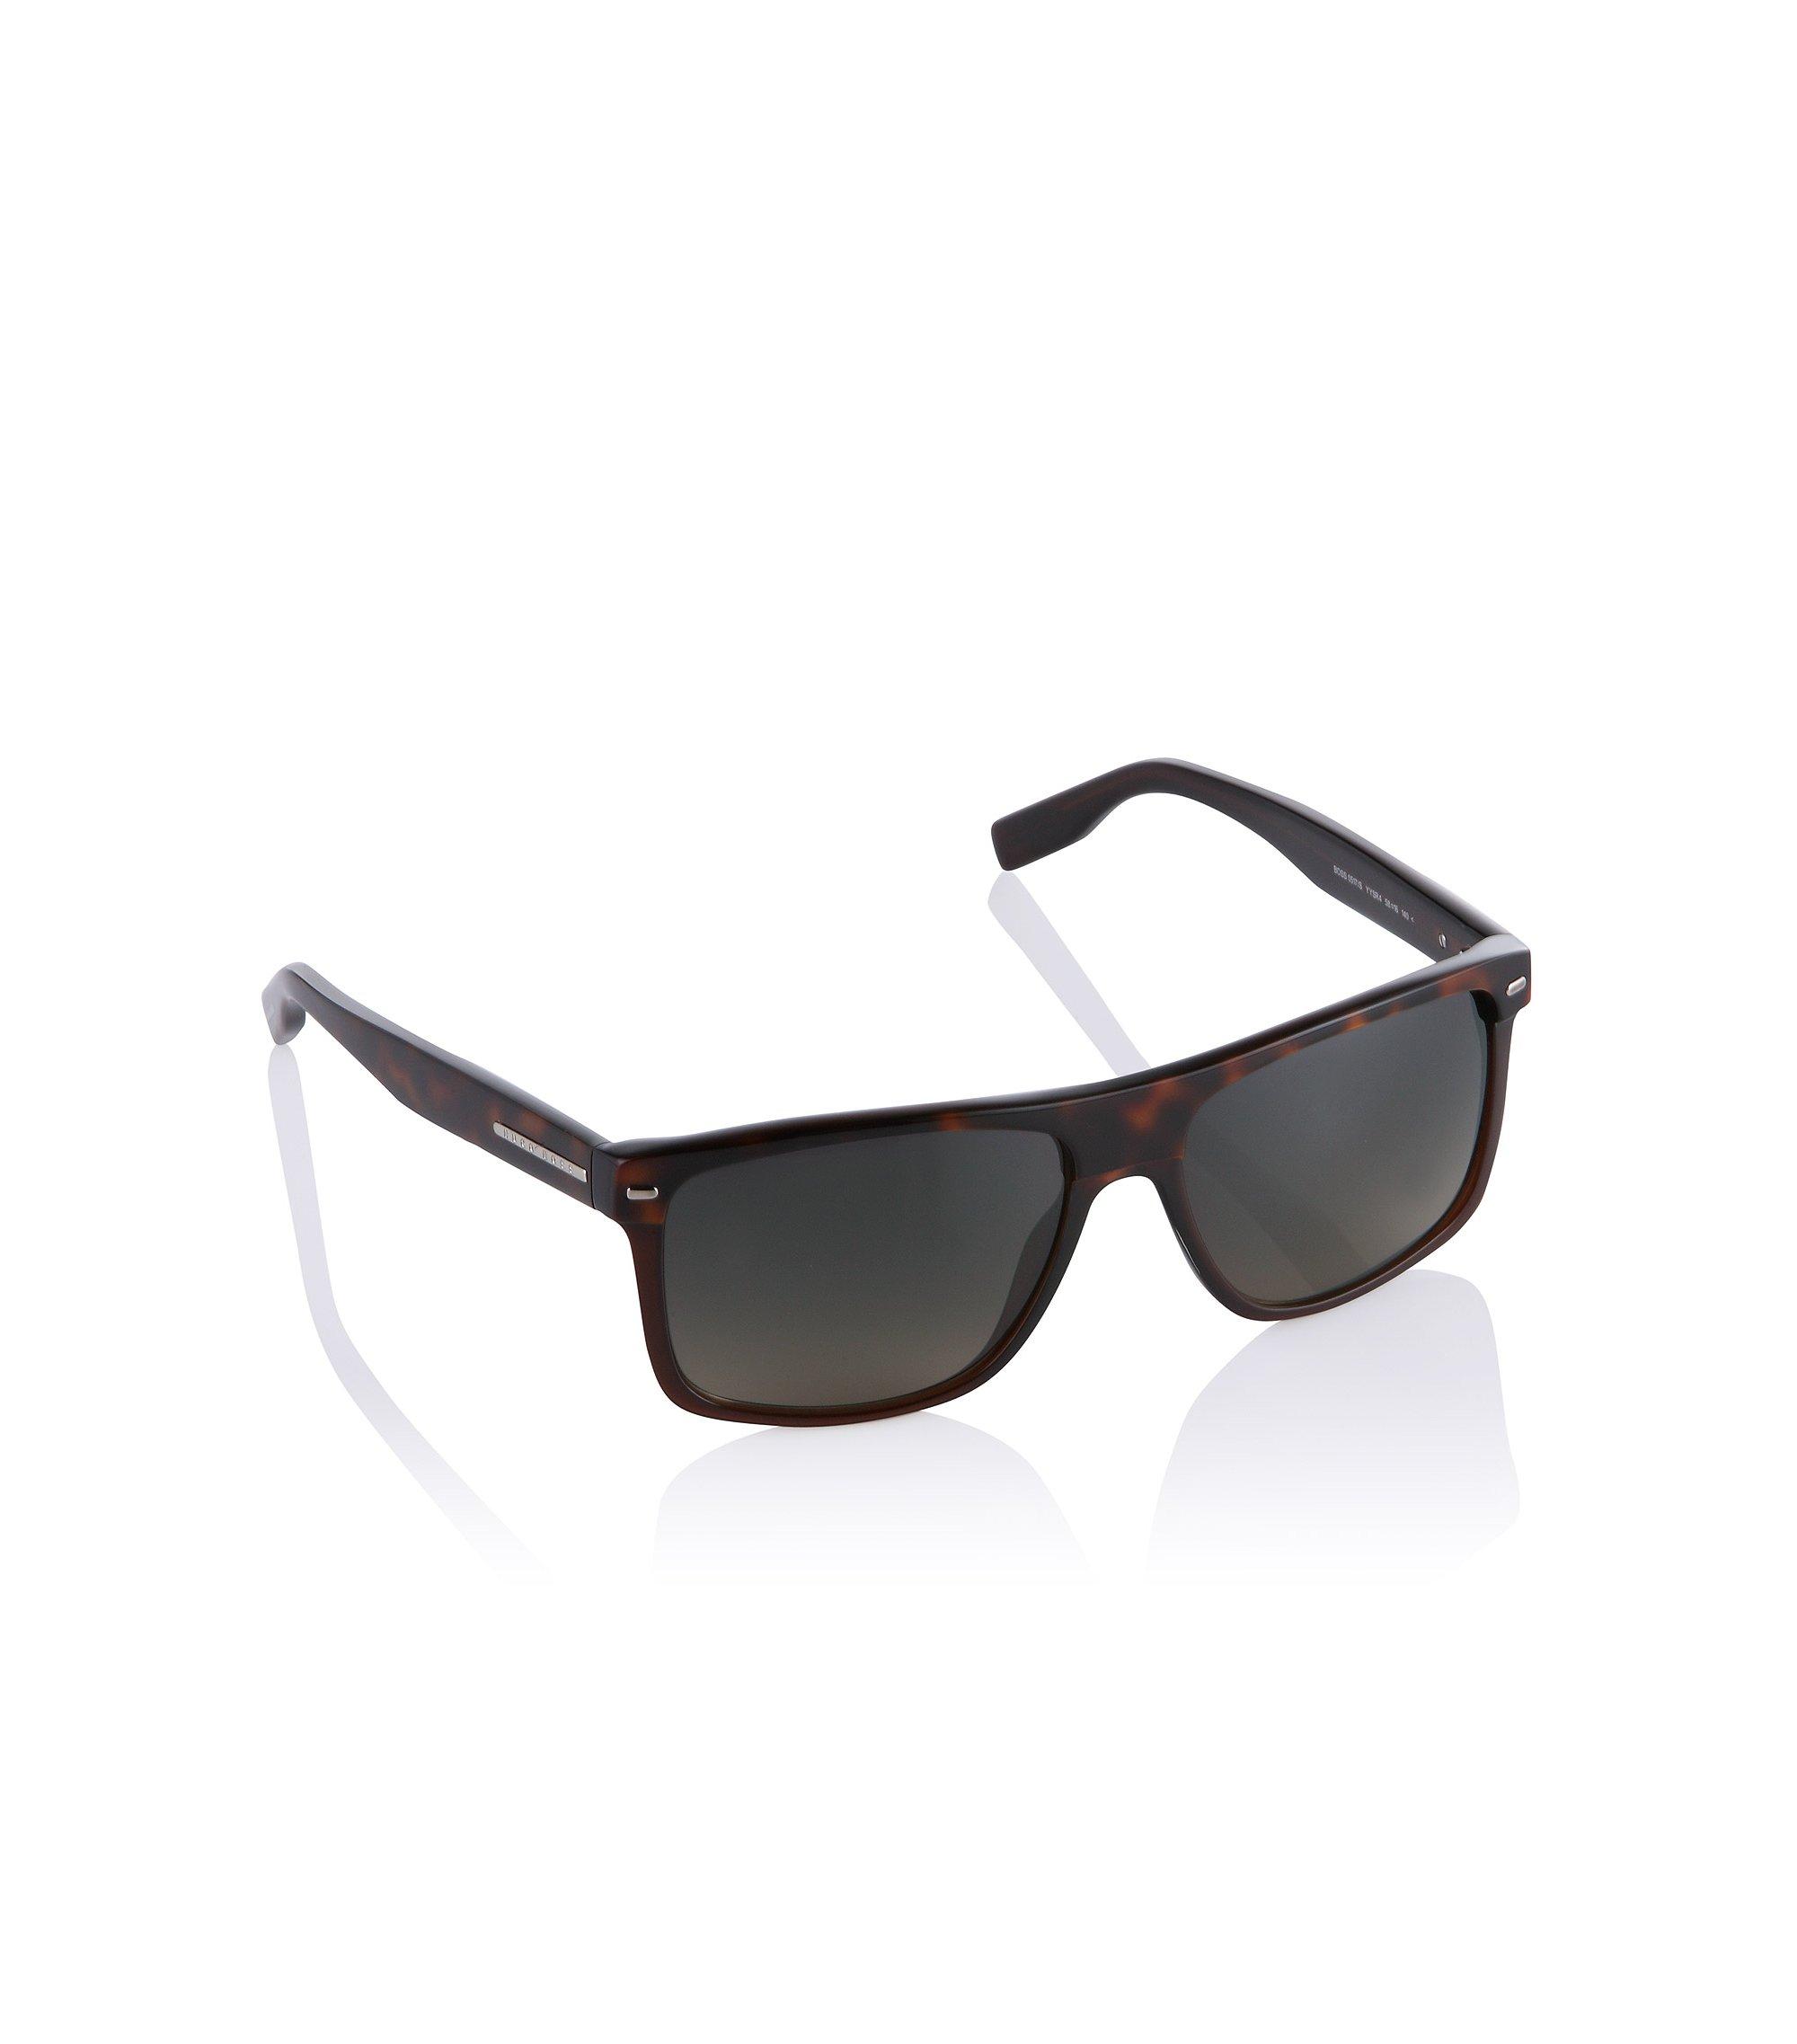 Aviator sunglasses '0517/S', Assorted-Pre-Pack